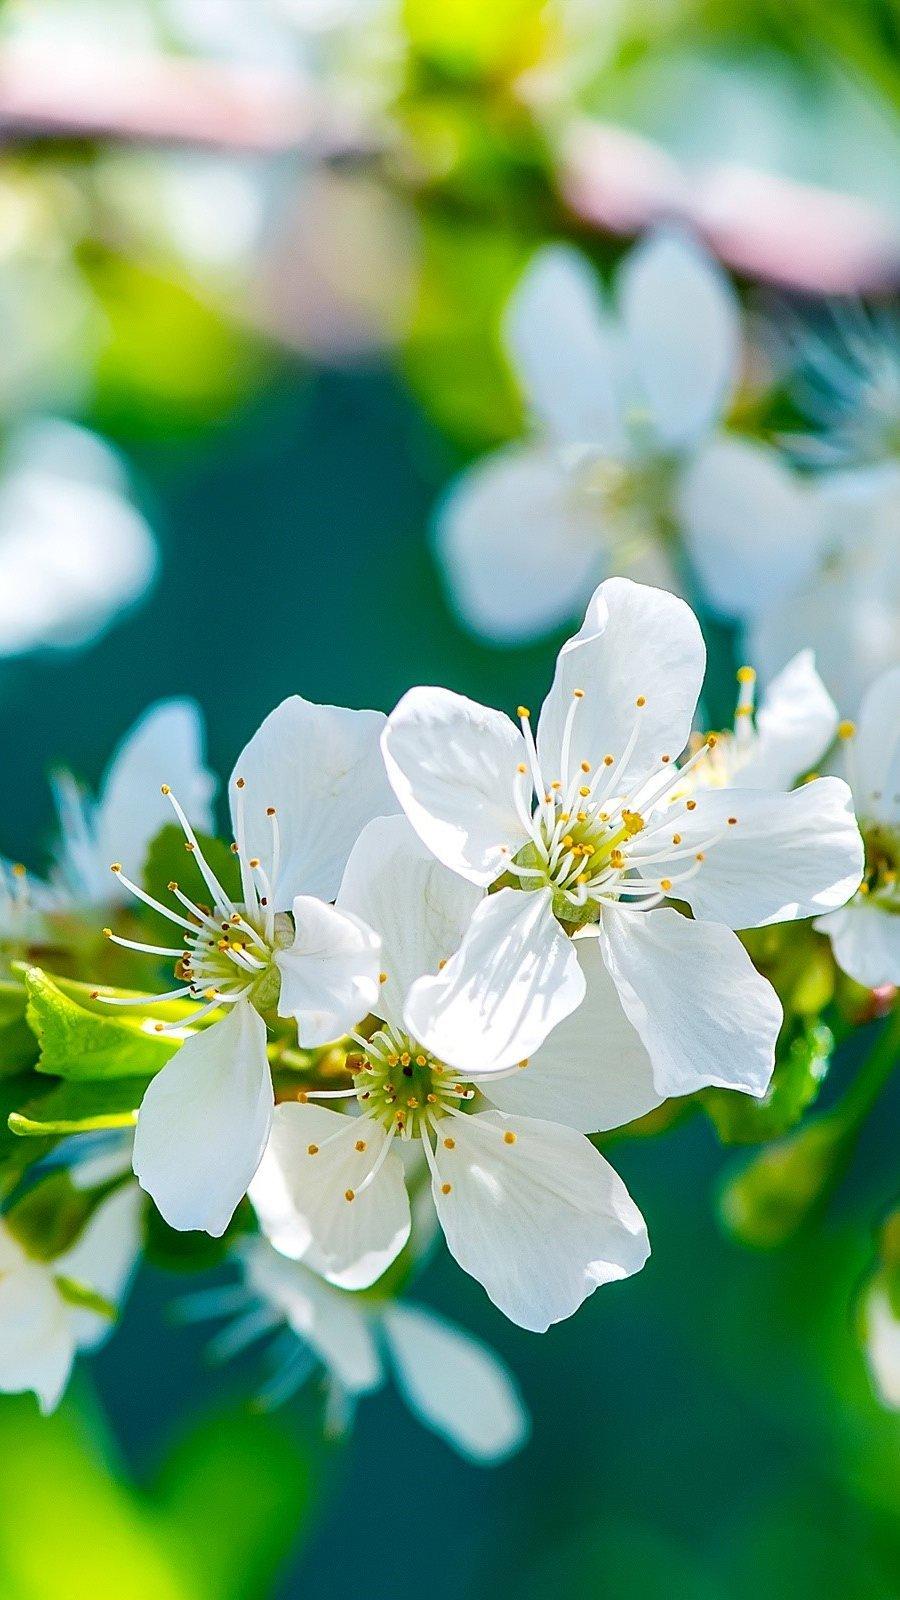 Wallpaper Flowers of an apple tree Vertical